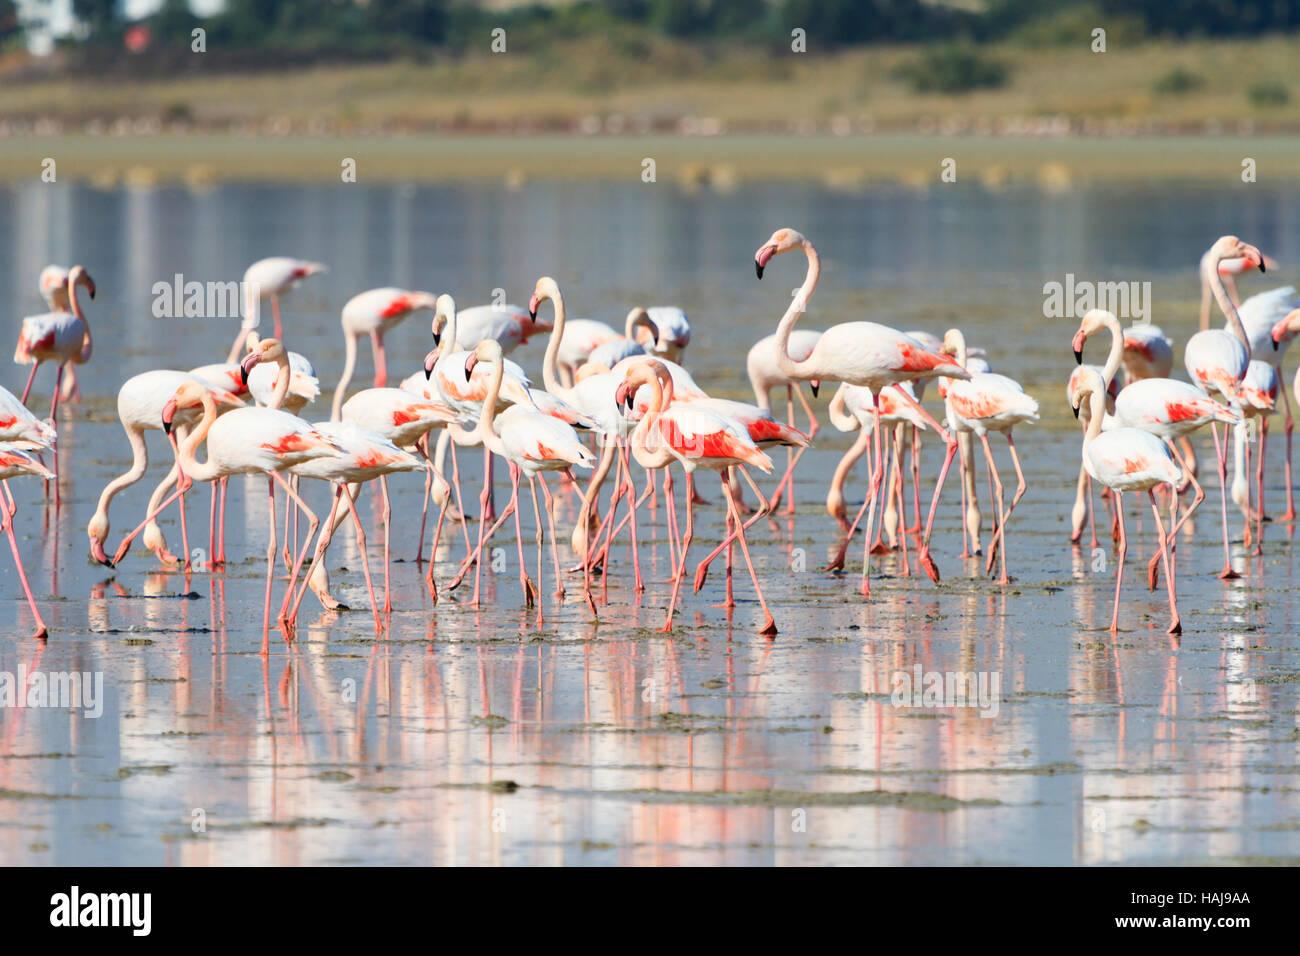 annual-flamingo-migration-to-larnaca-sal